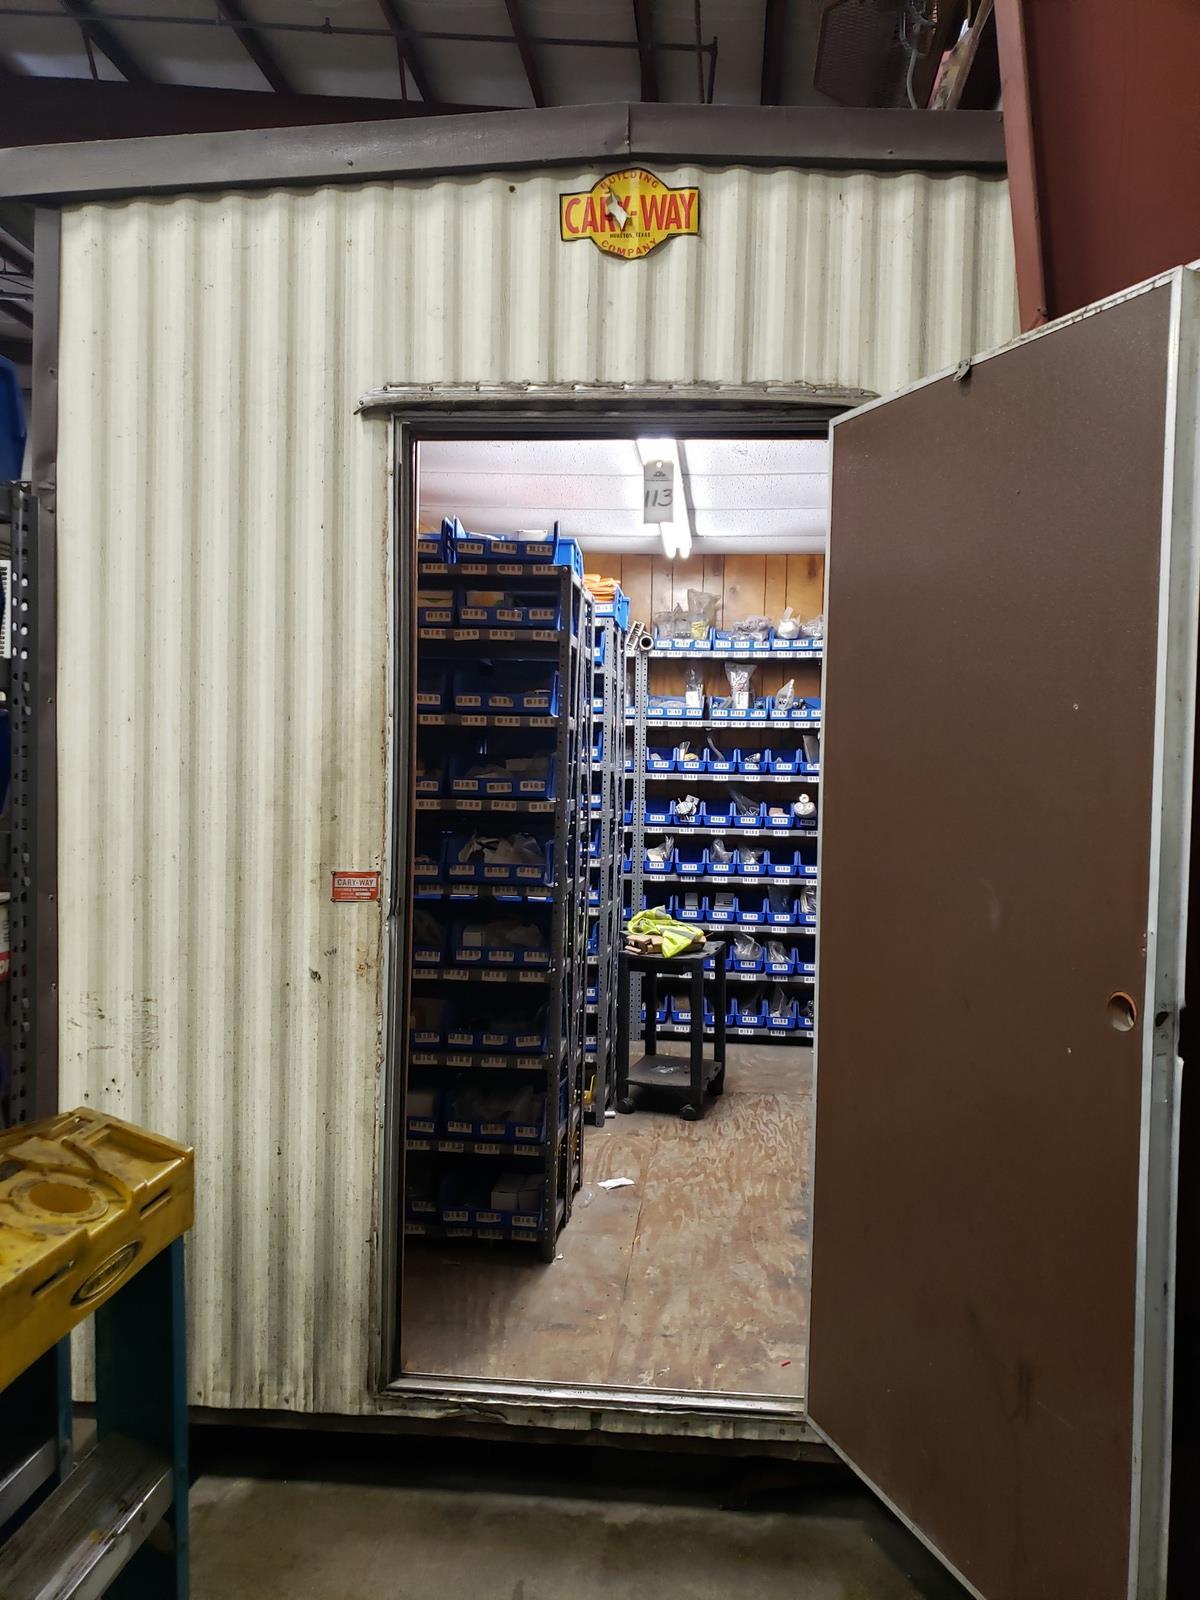 8' X 10' Storage Building, W/ Contents, Spare Parts